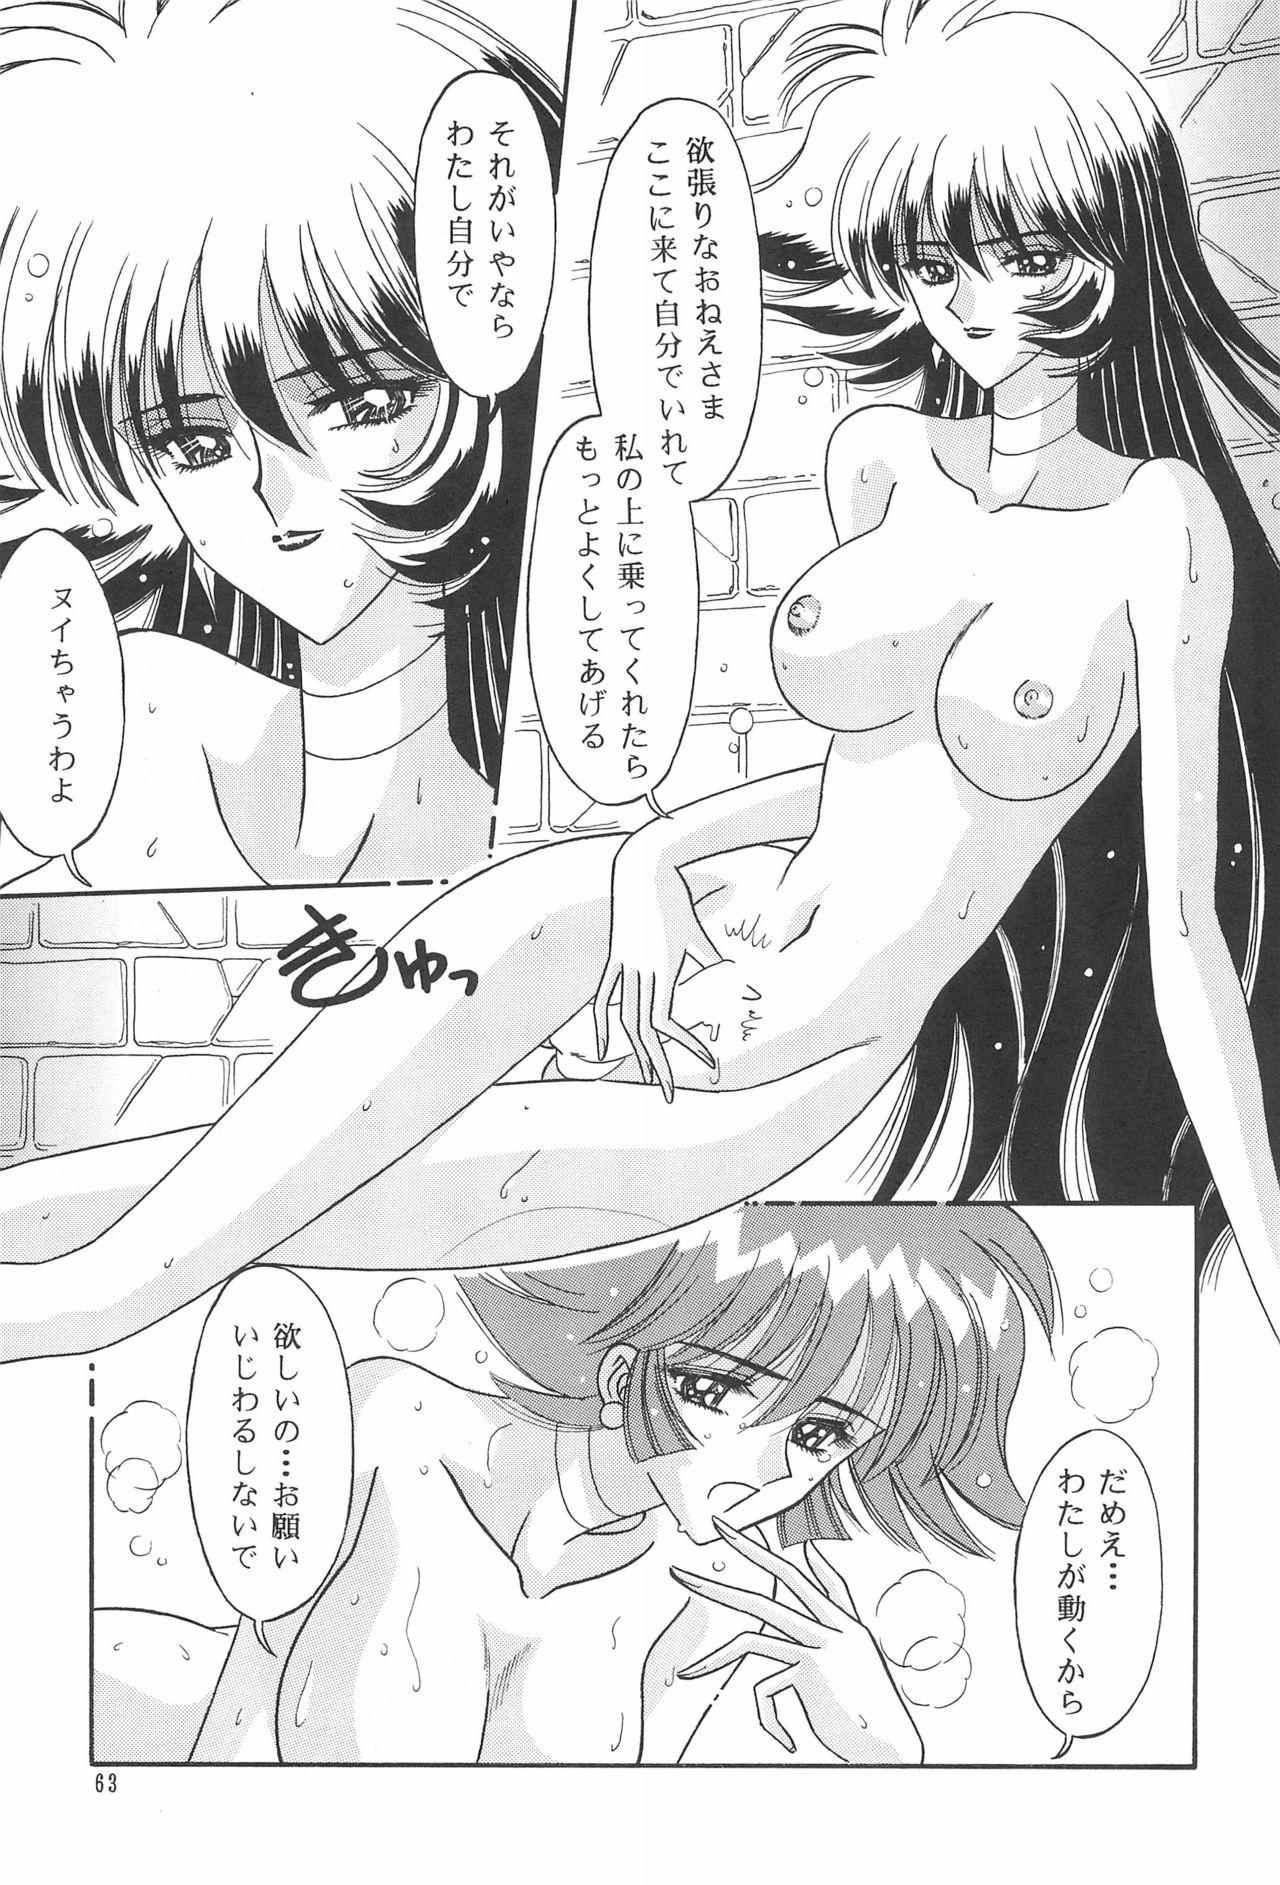 Showbaku 64